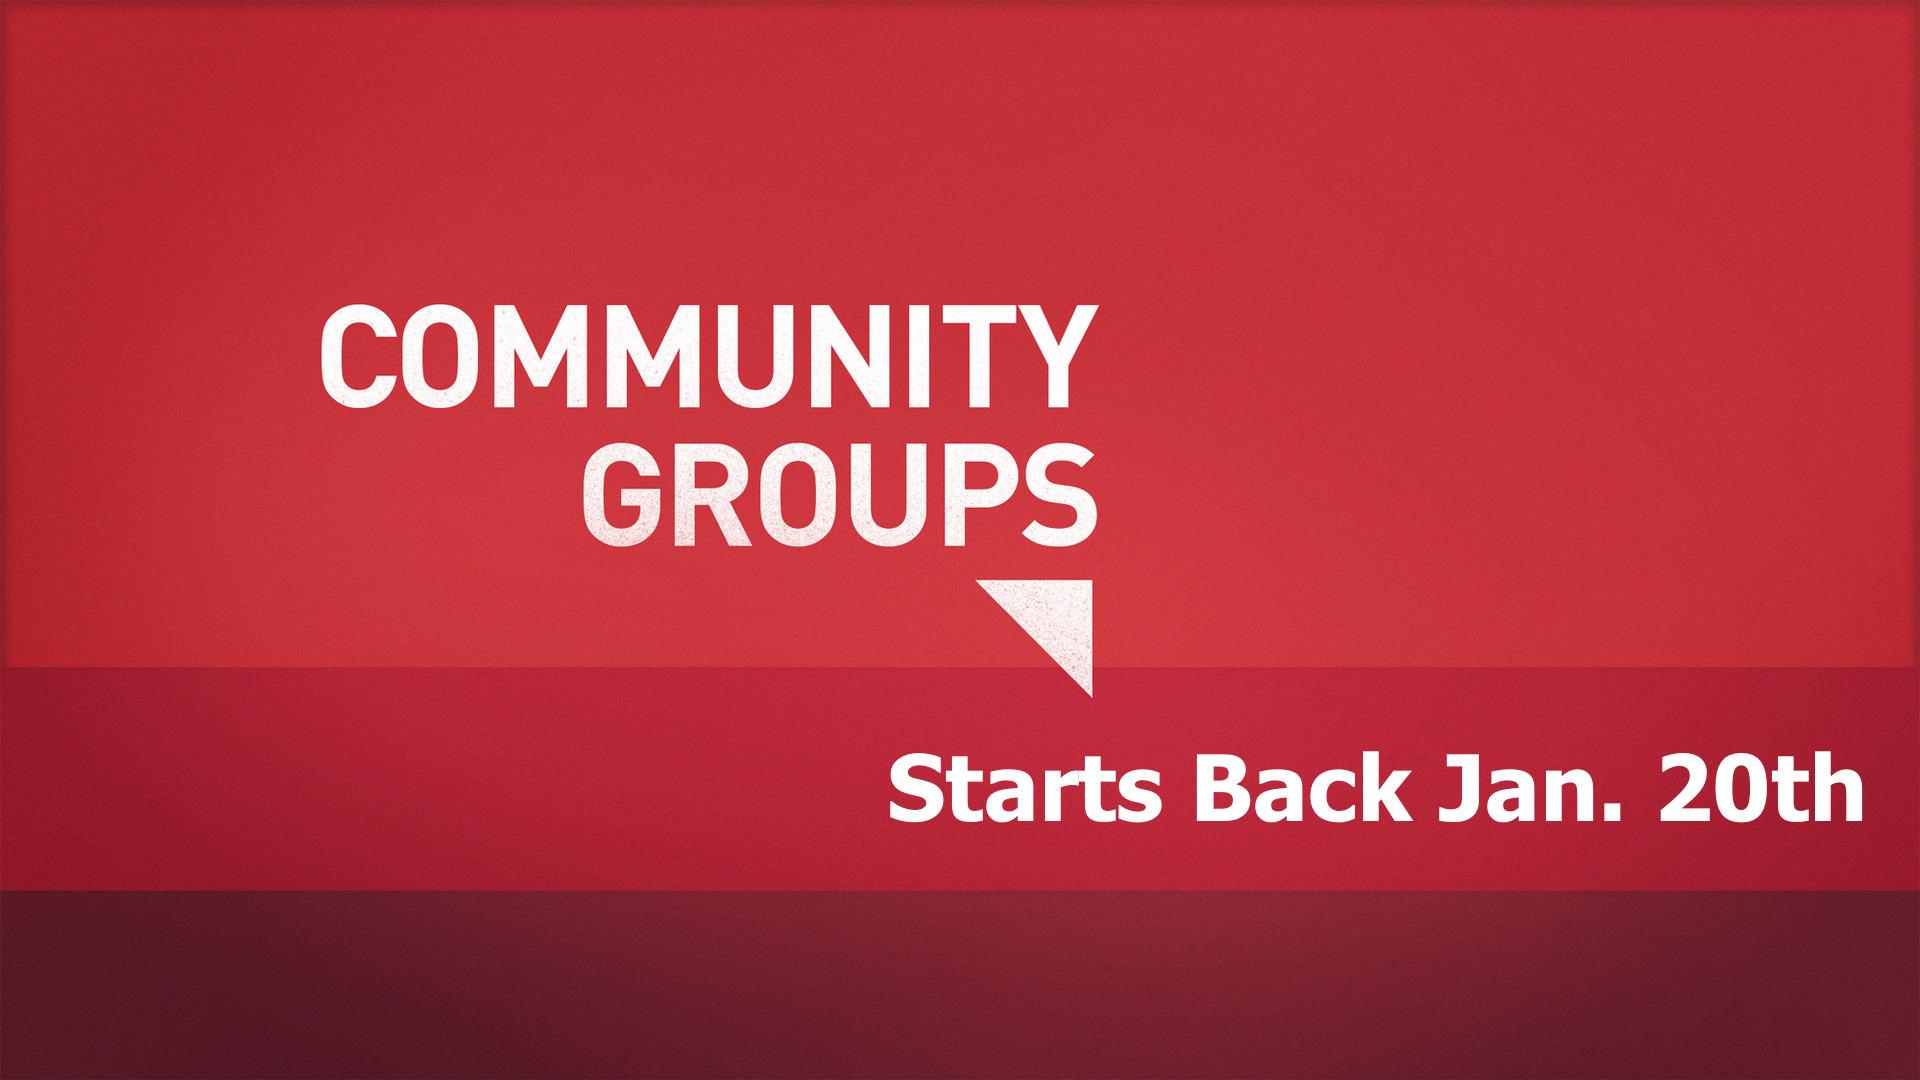 summer_stripes_community_groups-title-2-Wide 16x9 copy.jpg